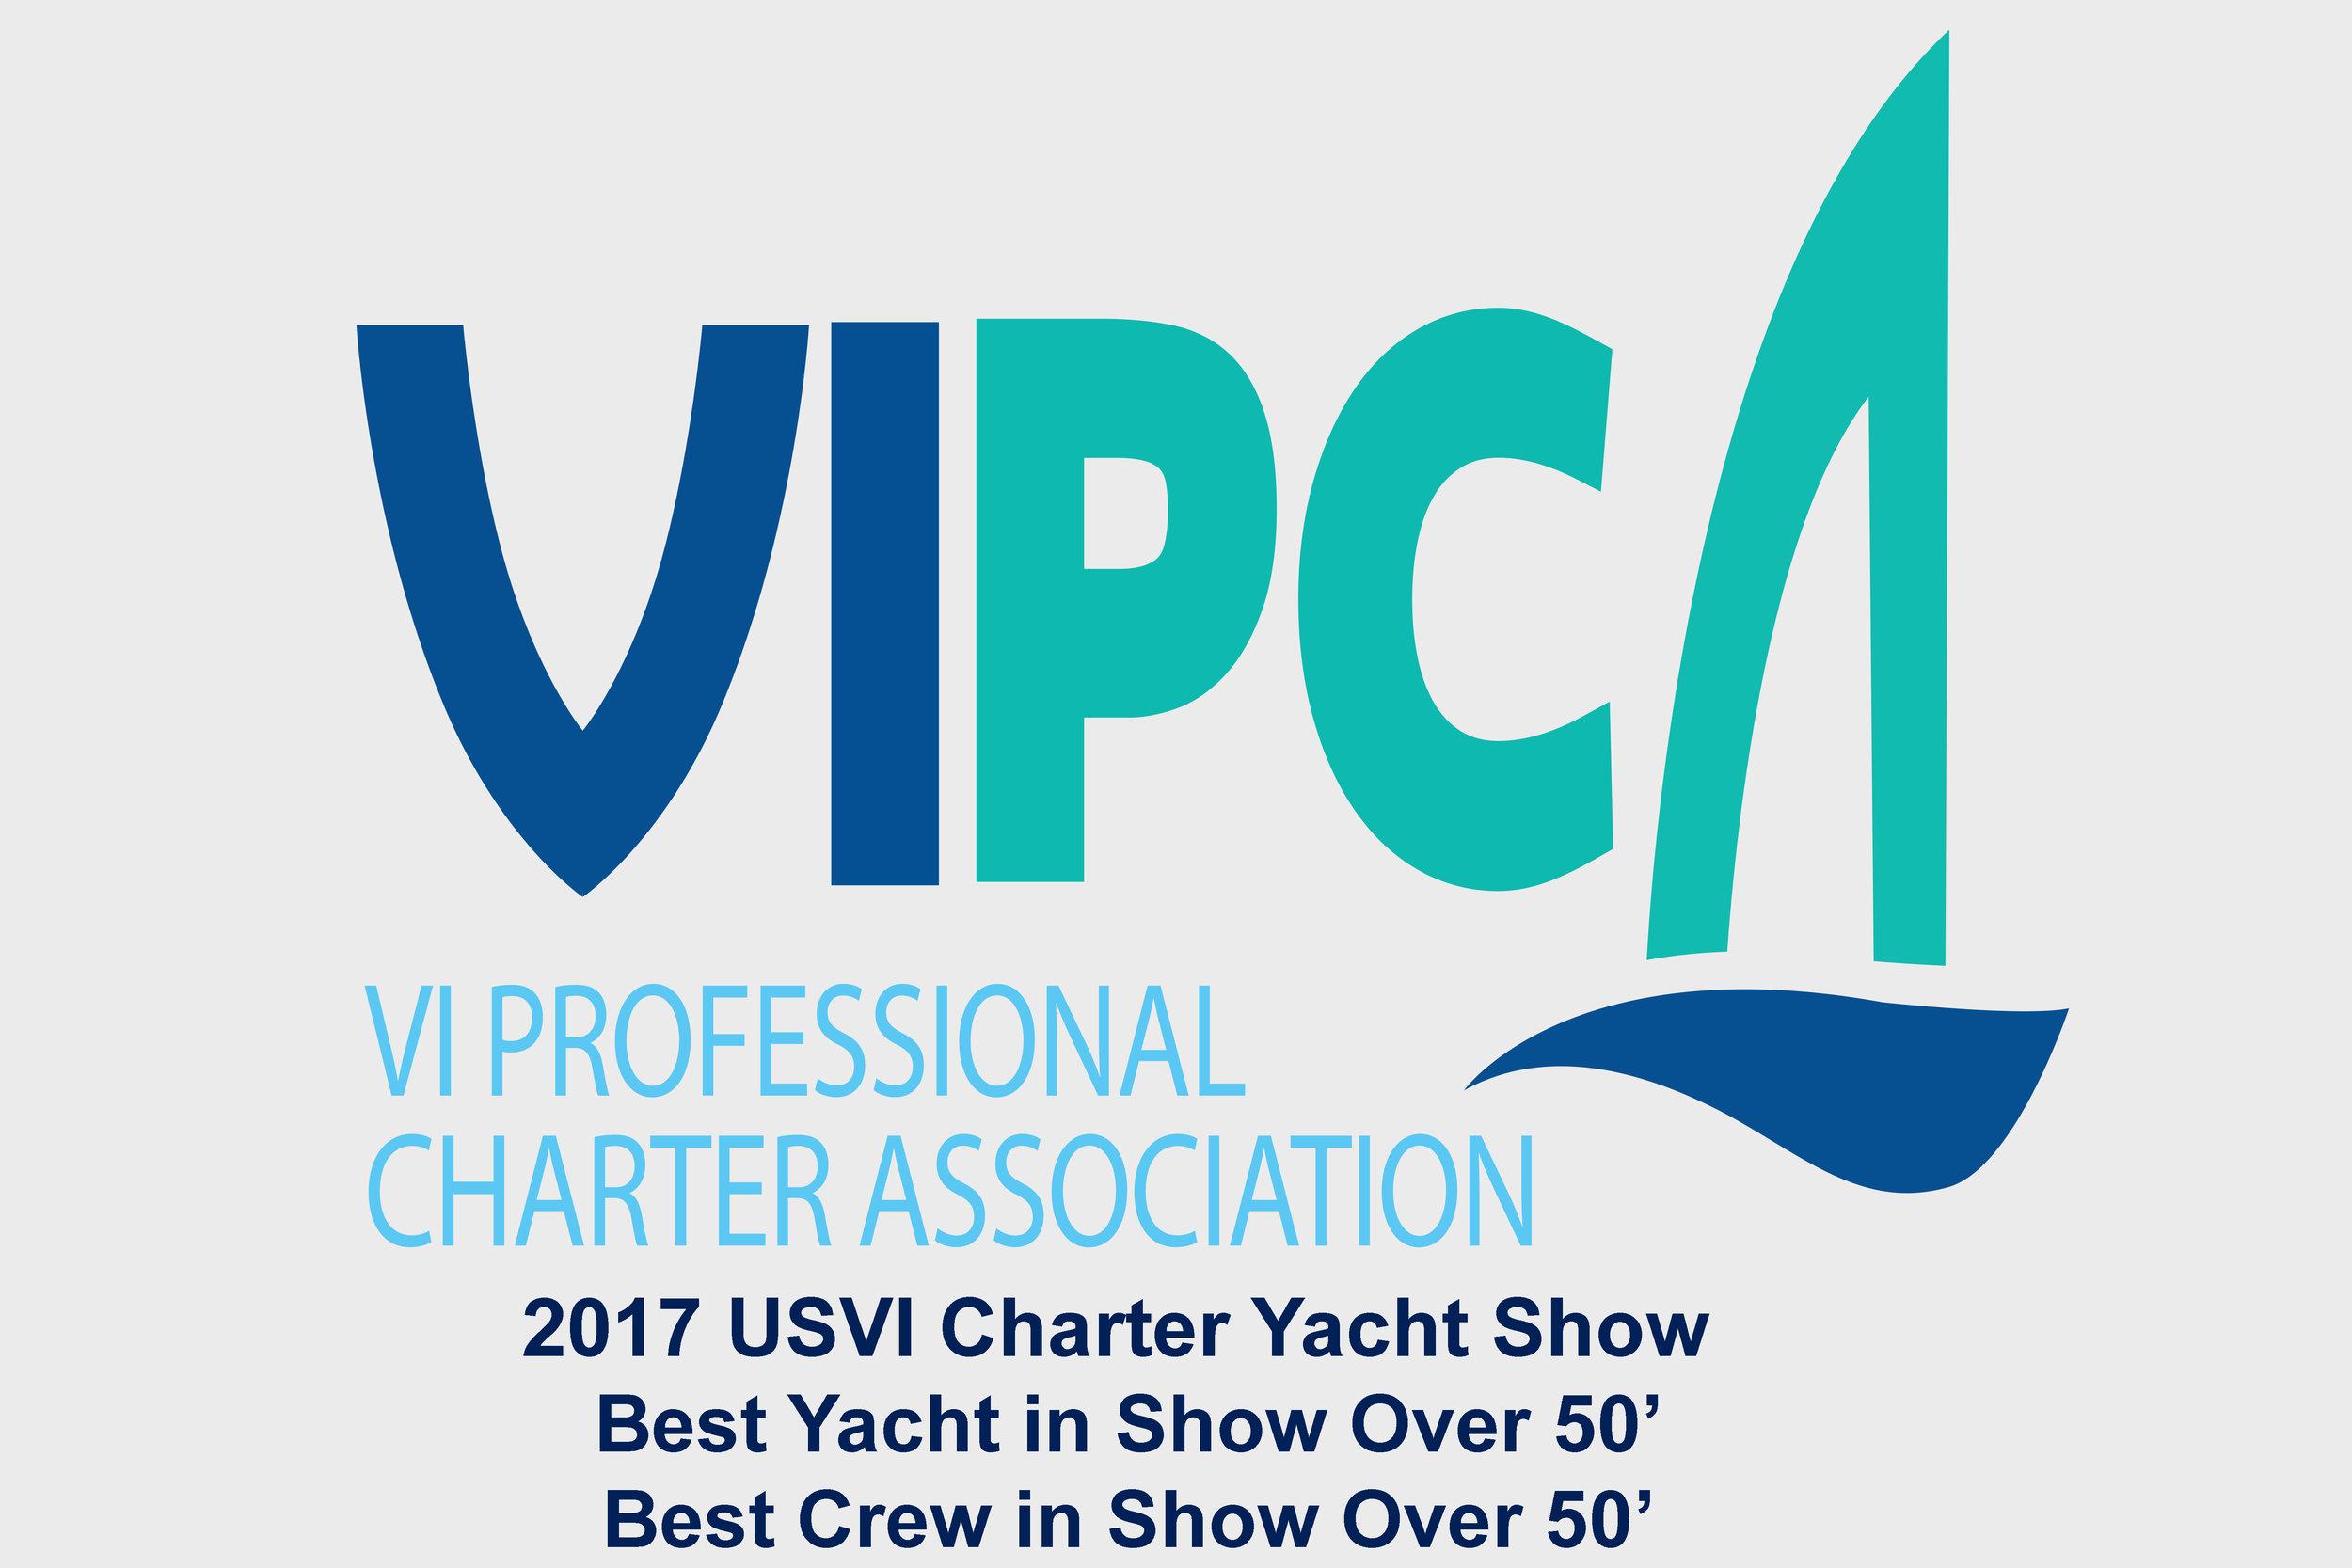 VIPCA Badge Boat.jpg